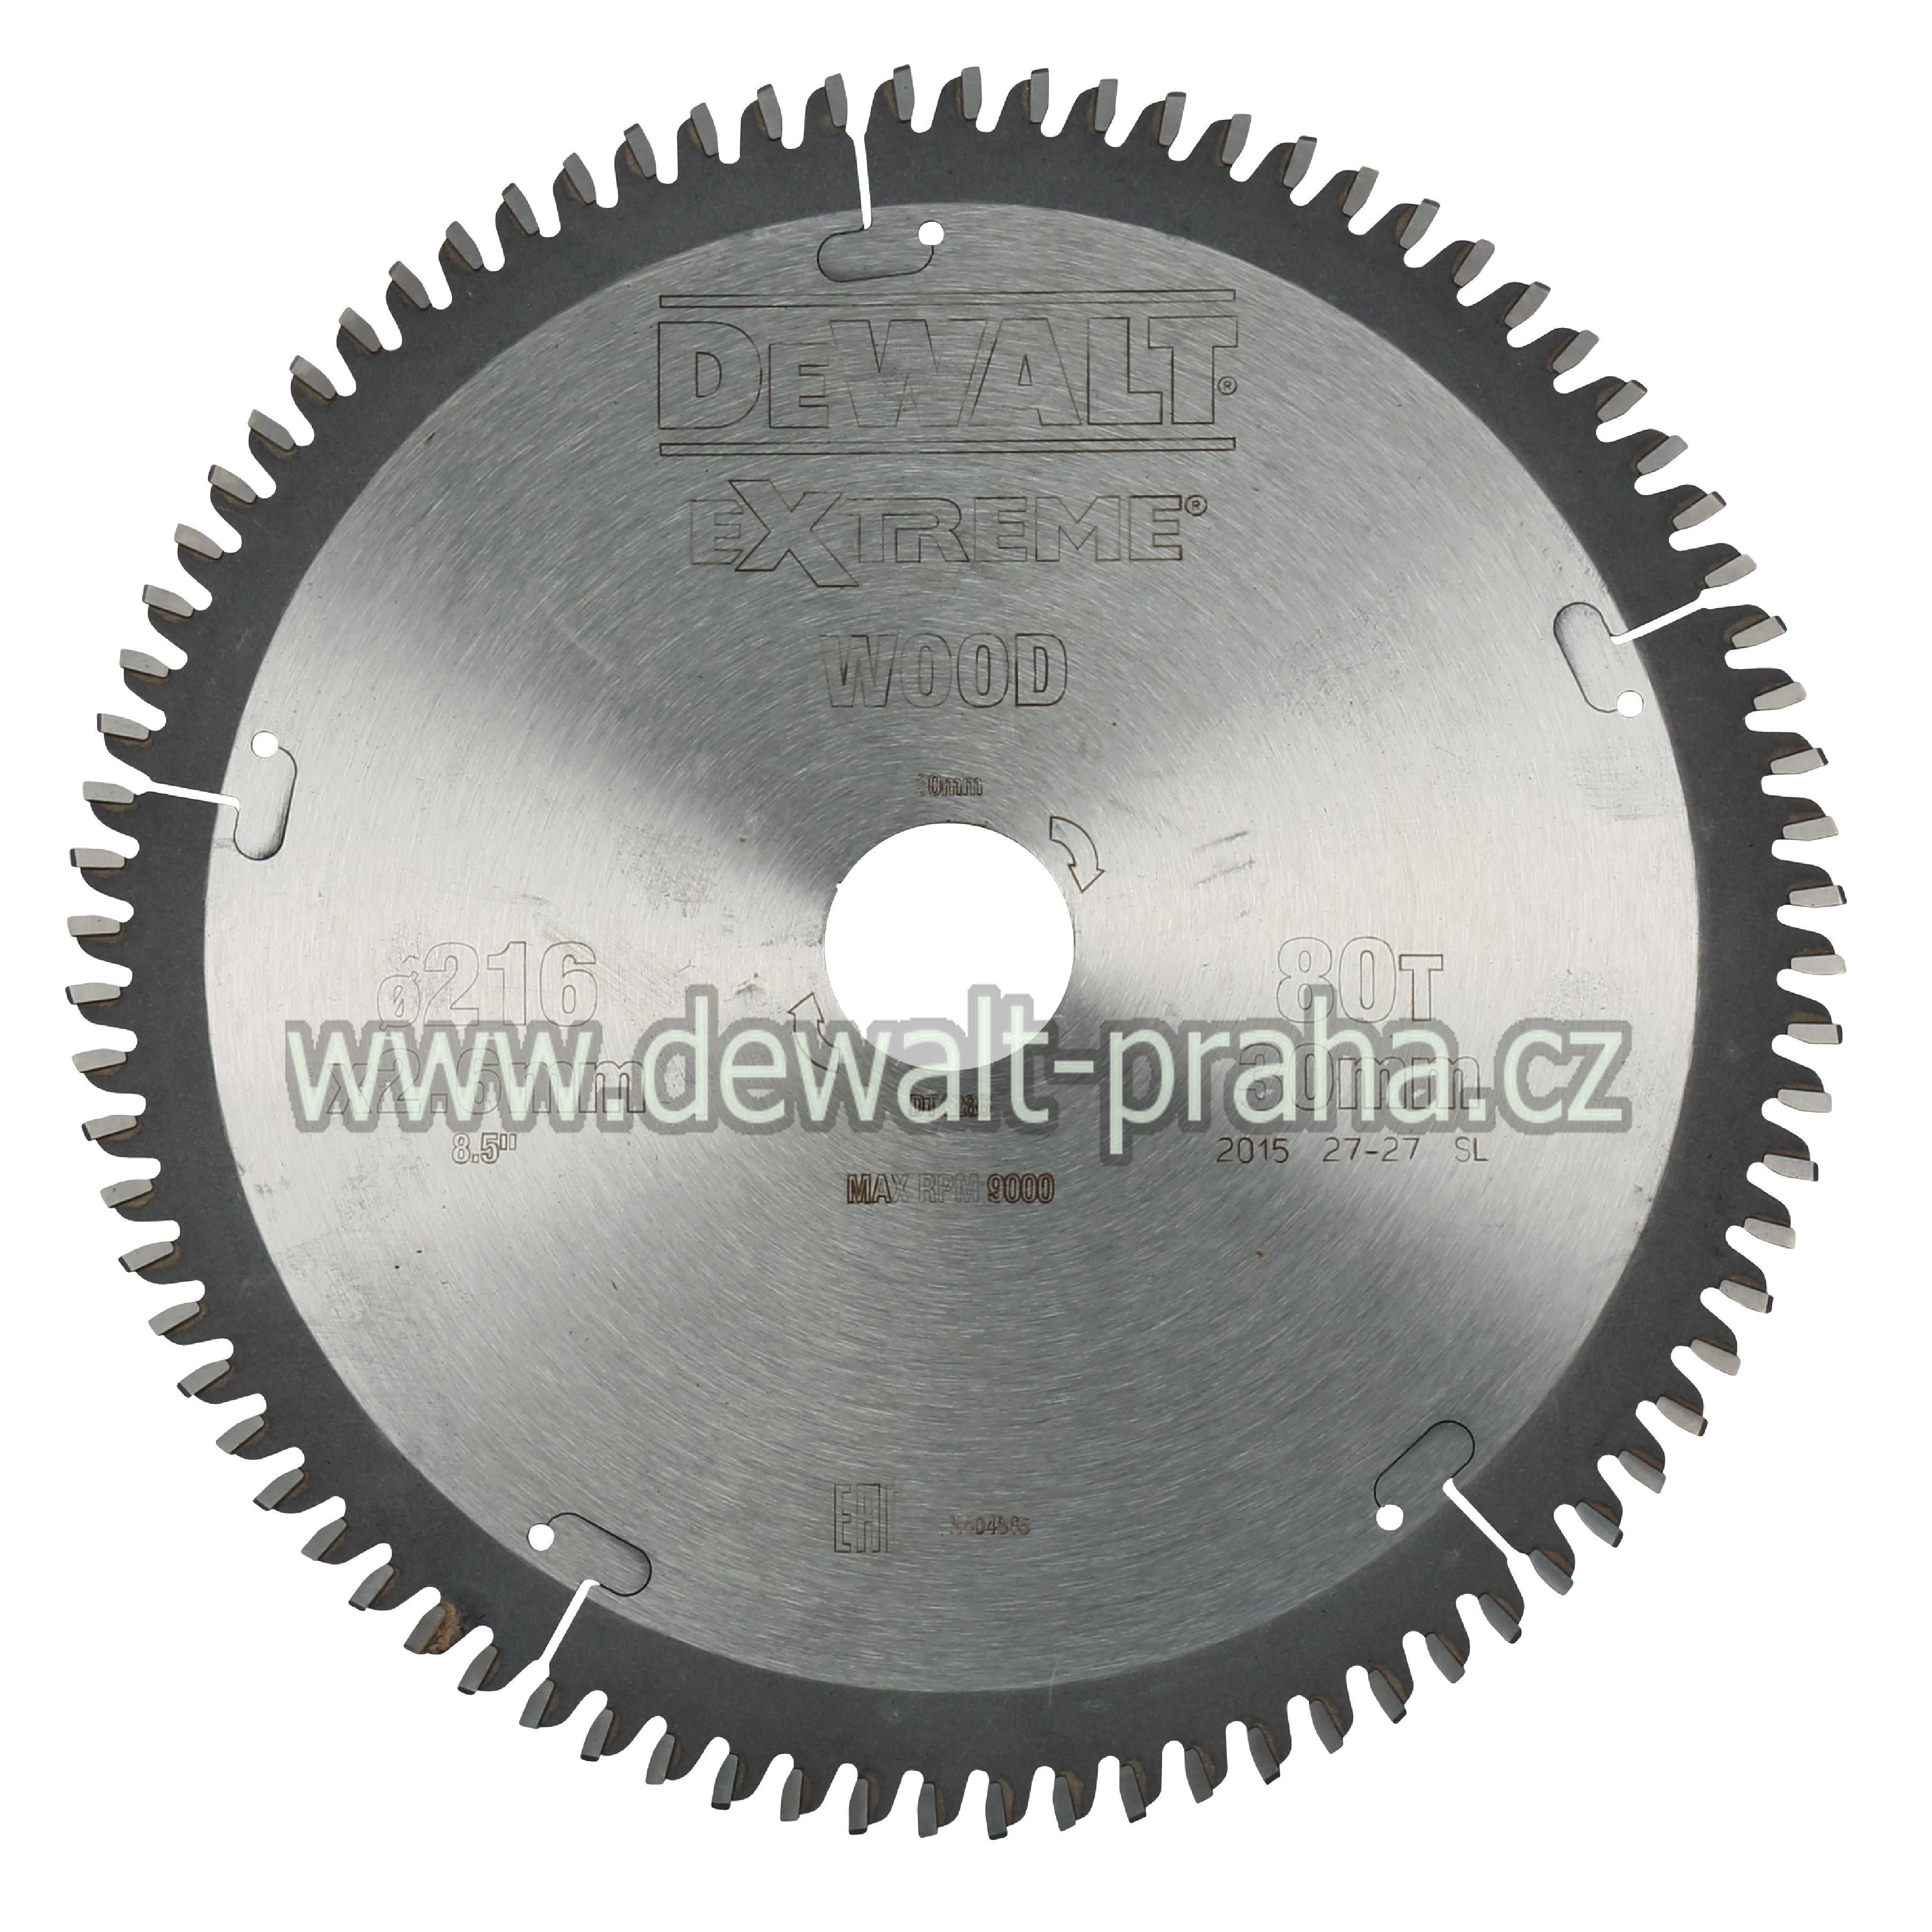 DT4015 DeWALT Pilový kotouč 235 x 30 mm, 18 zubů